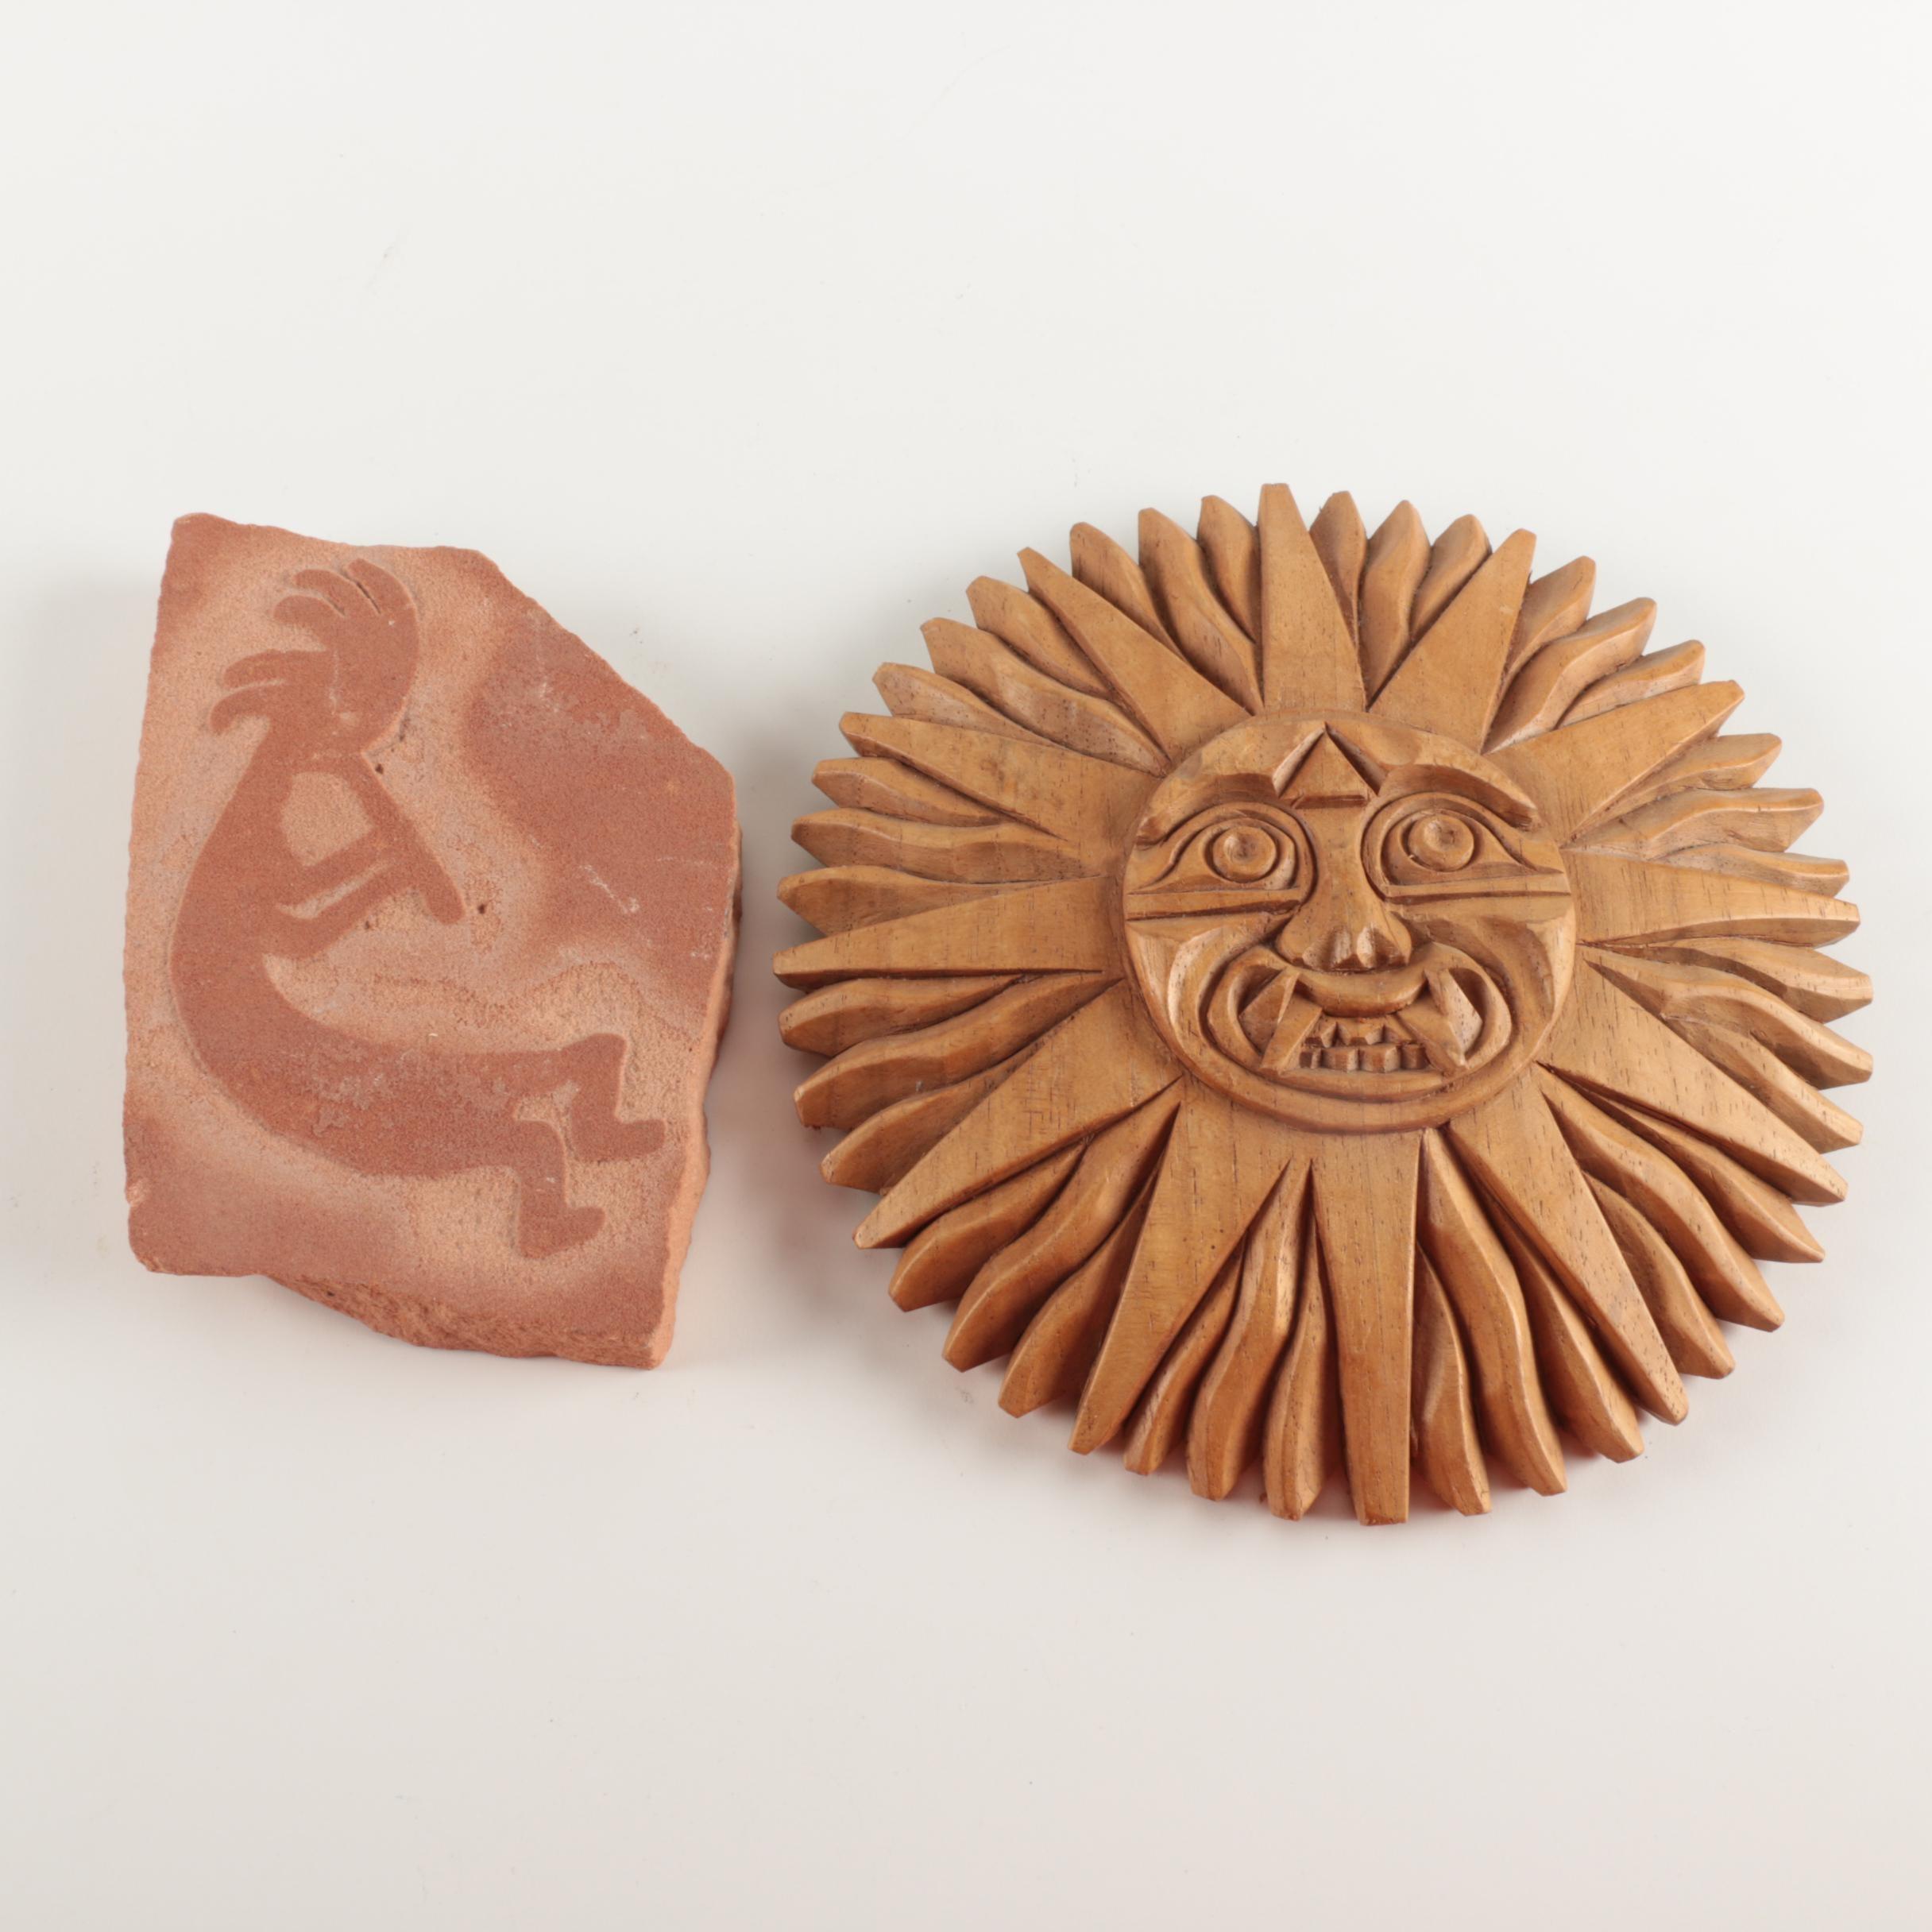 Ceramic Kokapelli and Carved Wood Mayan Sun God